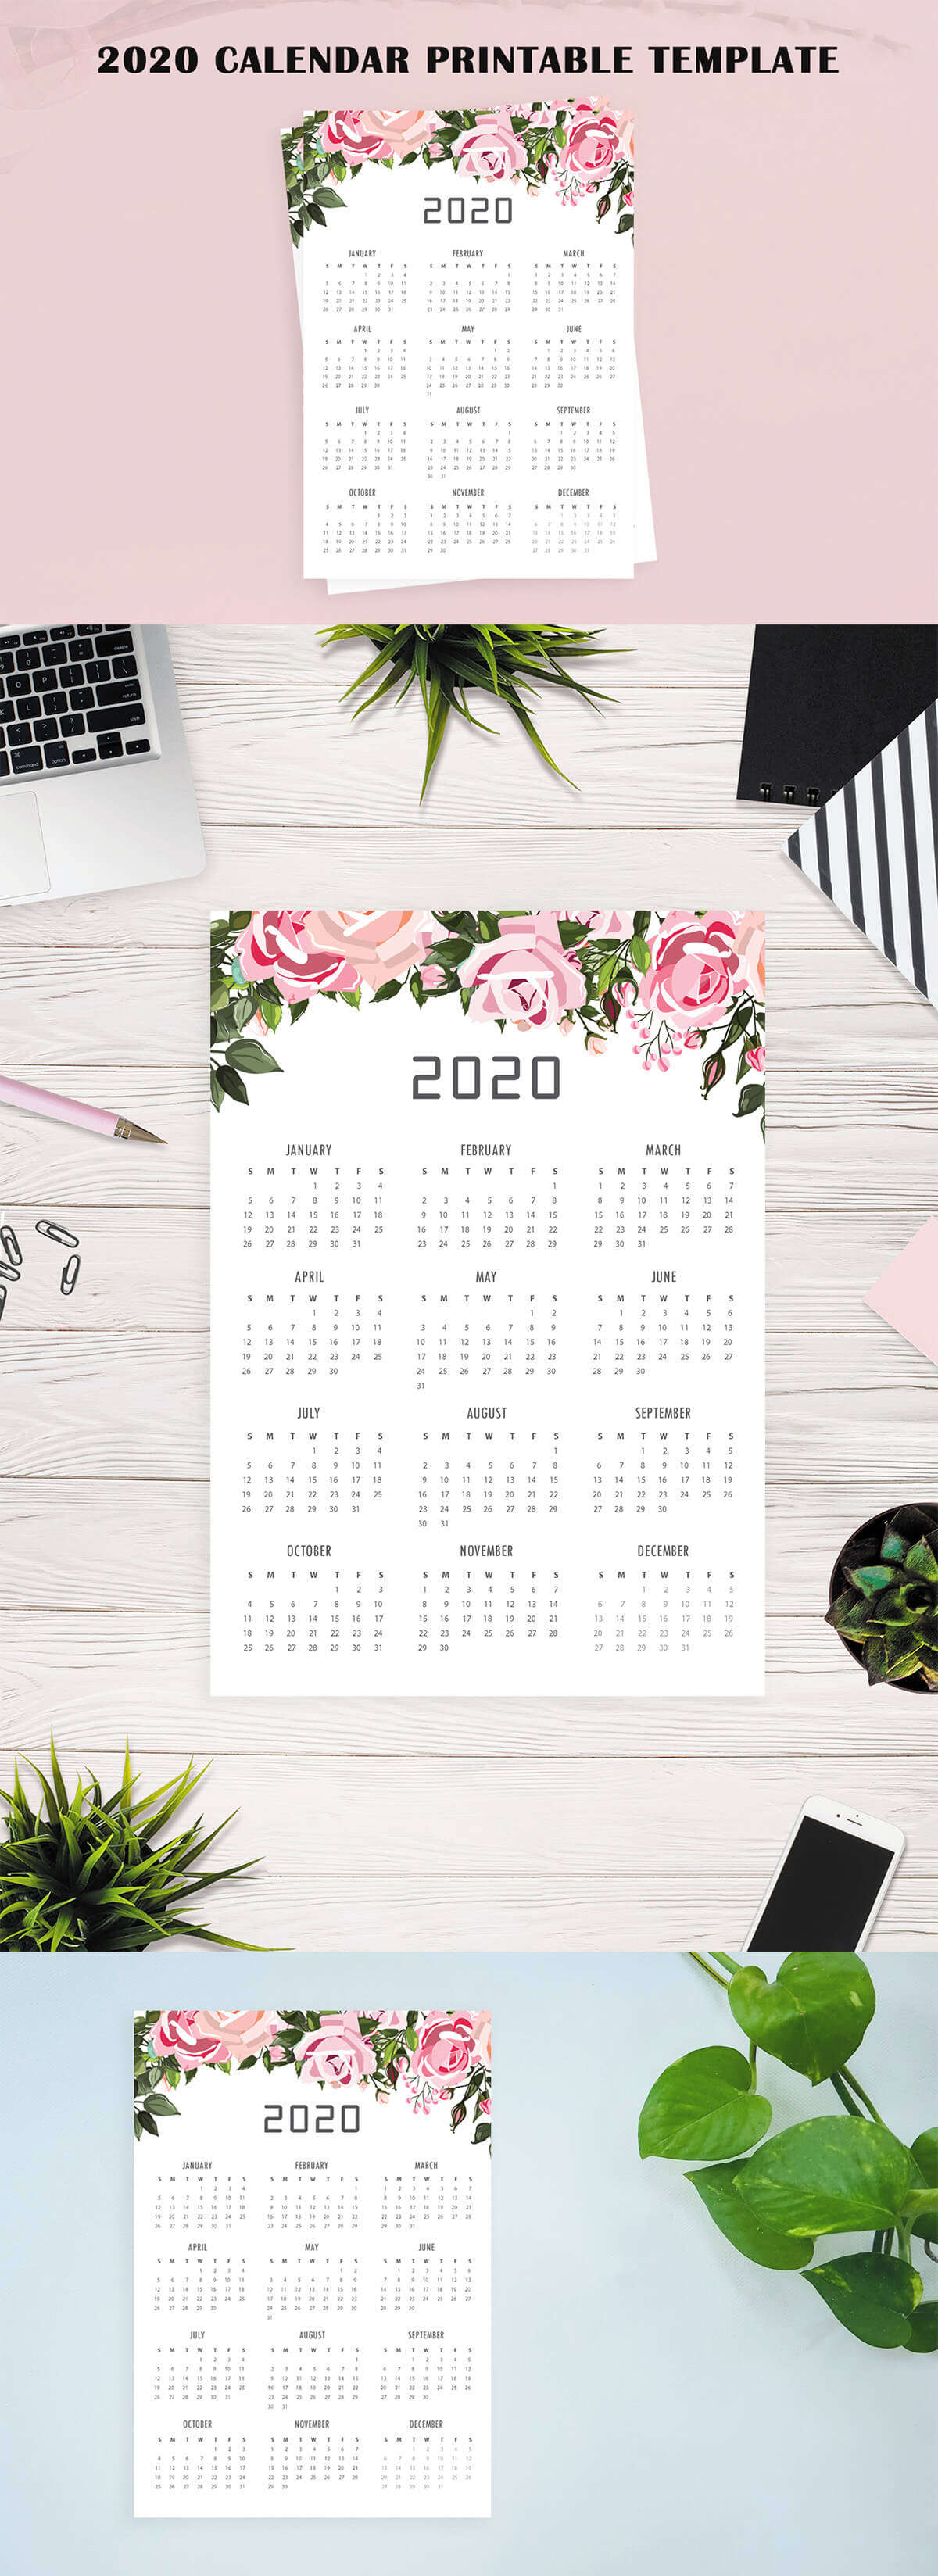 Free 2020 Calendar Printable Template